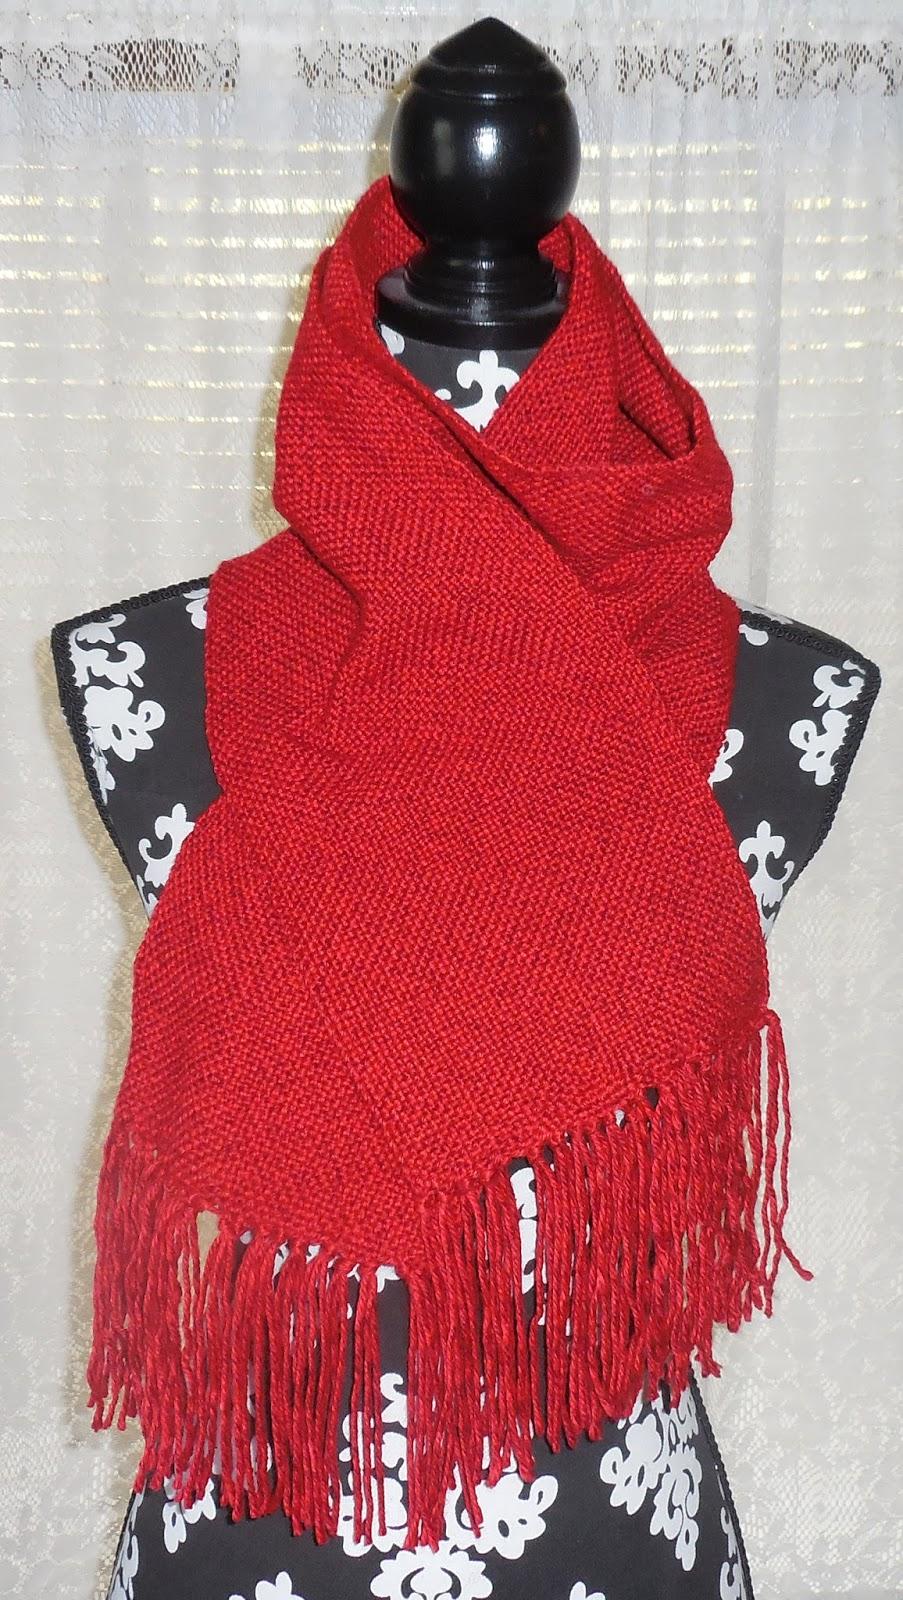 Knitting In The Heartland 2015 : Knitting ii hand woven scarf